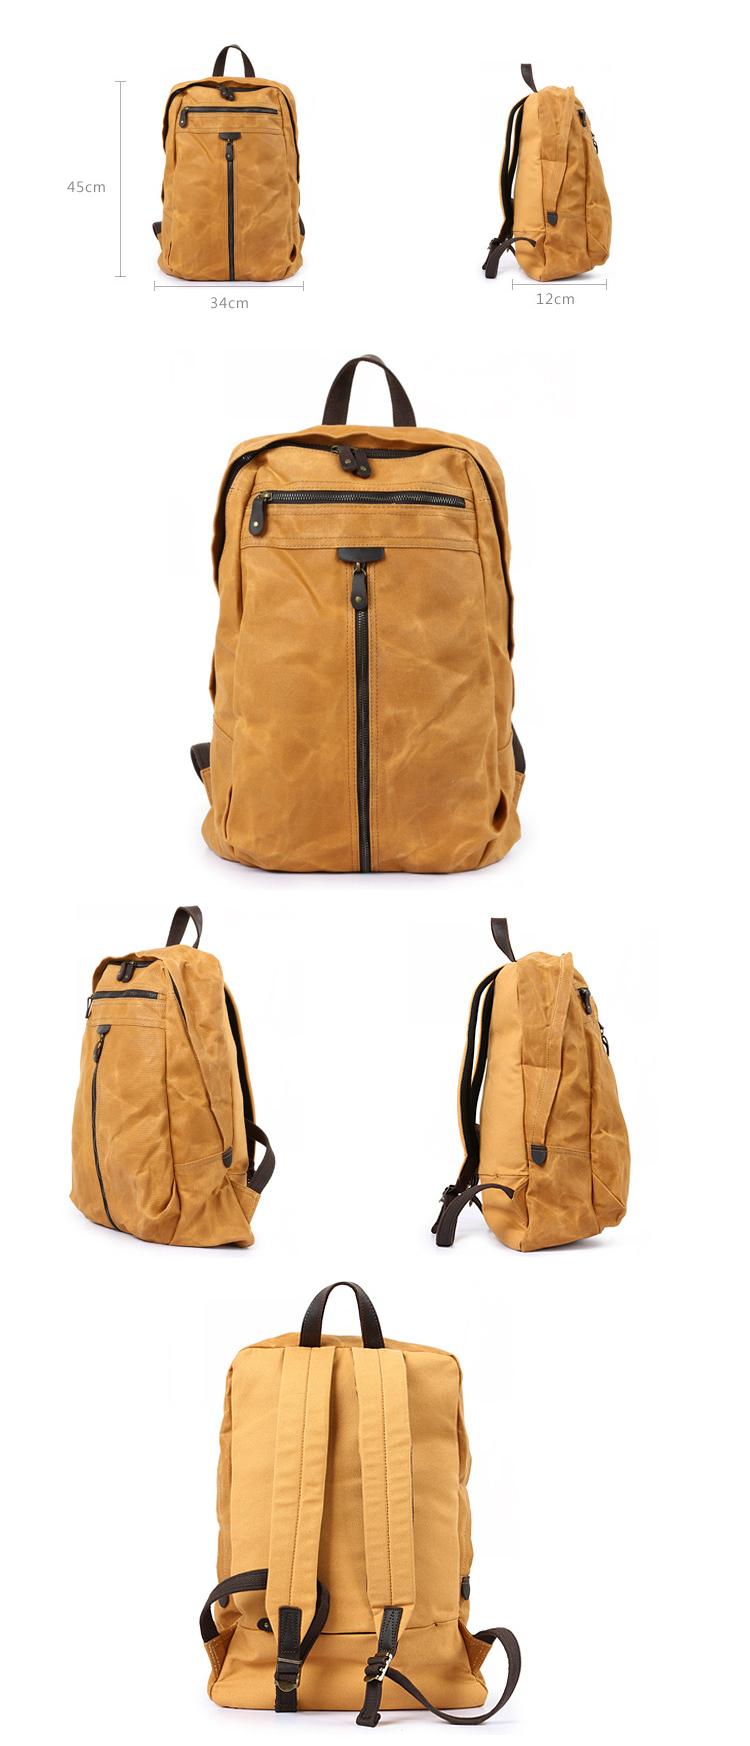 2018 Fancy vintage wholesale latest design brand waxed canvas satchel water proof resistant rucksack backpack bag